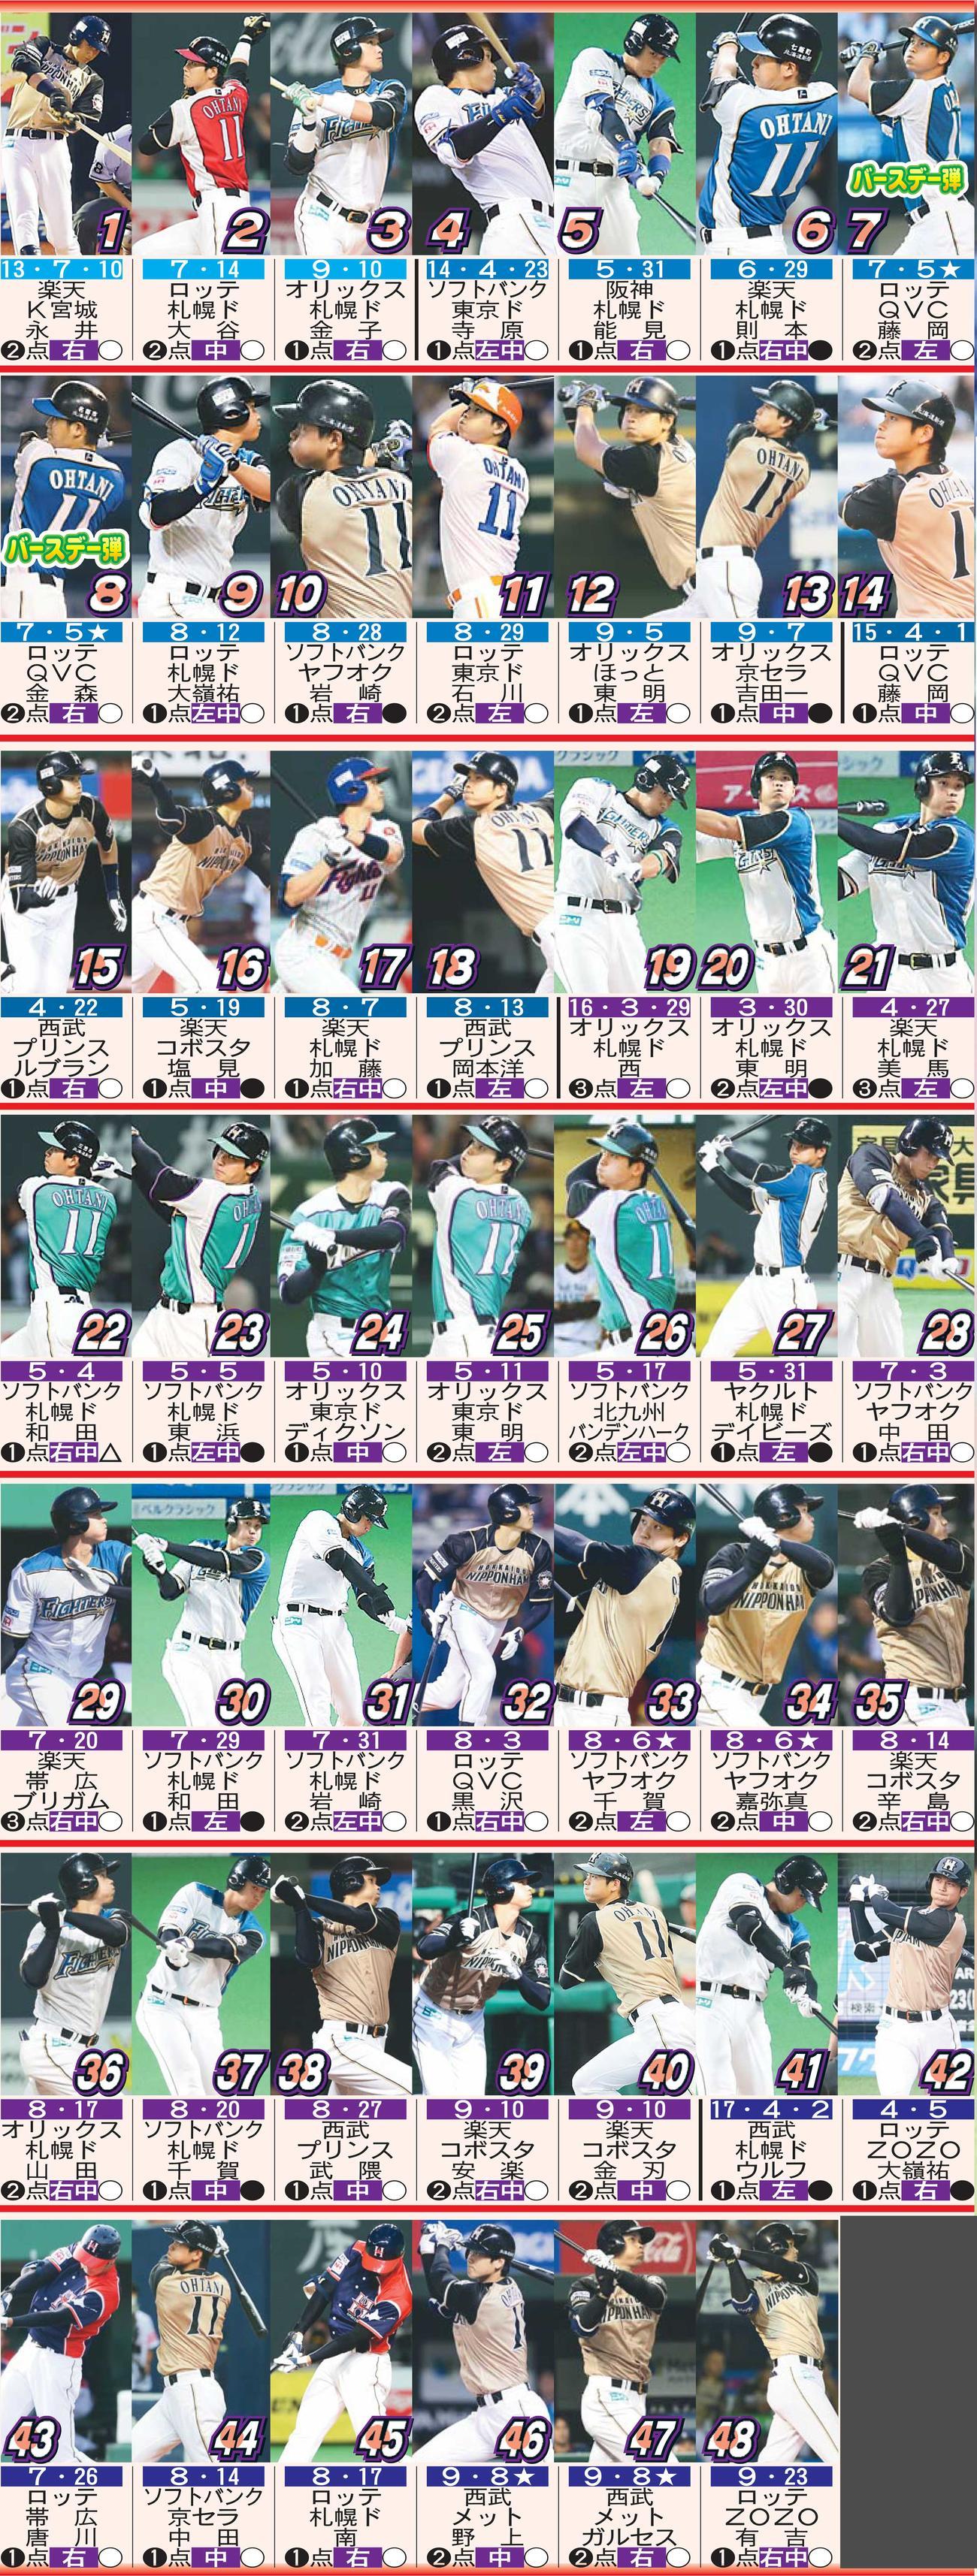 大谷翔平のNPB本塁打48本 ※上から日付(★同日2発)、対戦チーム、球場、投手、打点、方向、勝敗